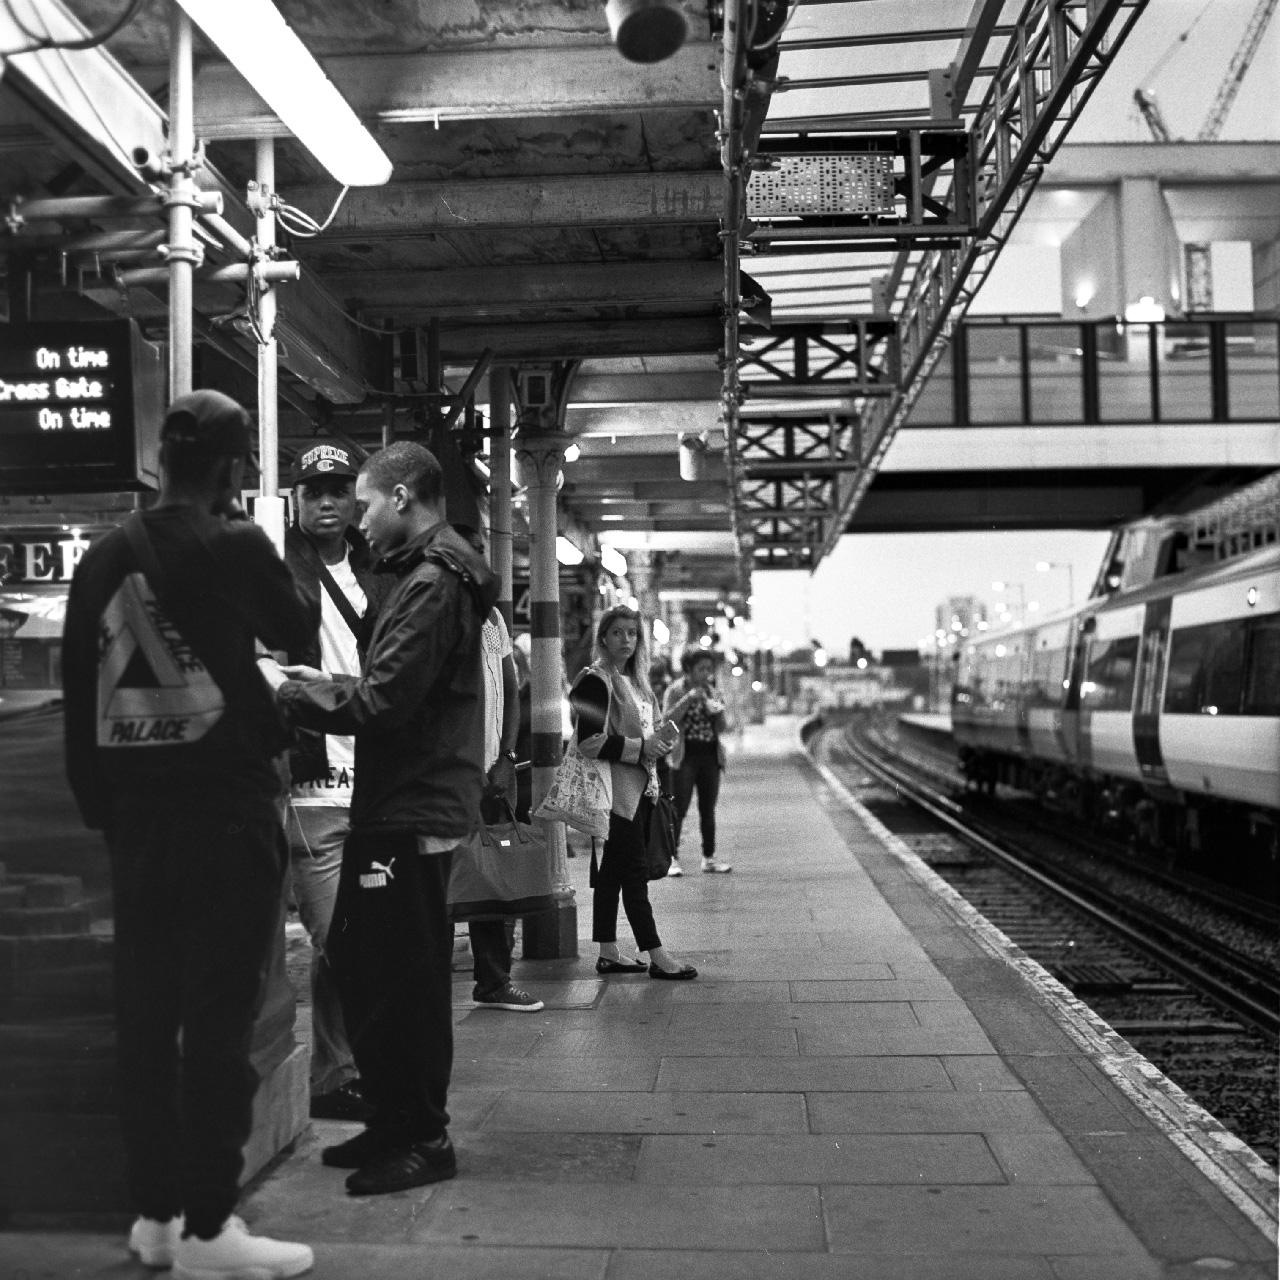 Train station somewhere